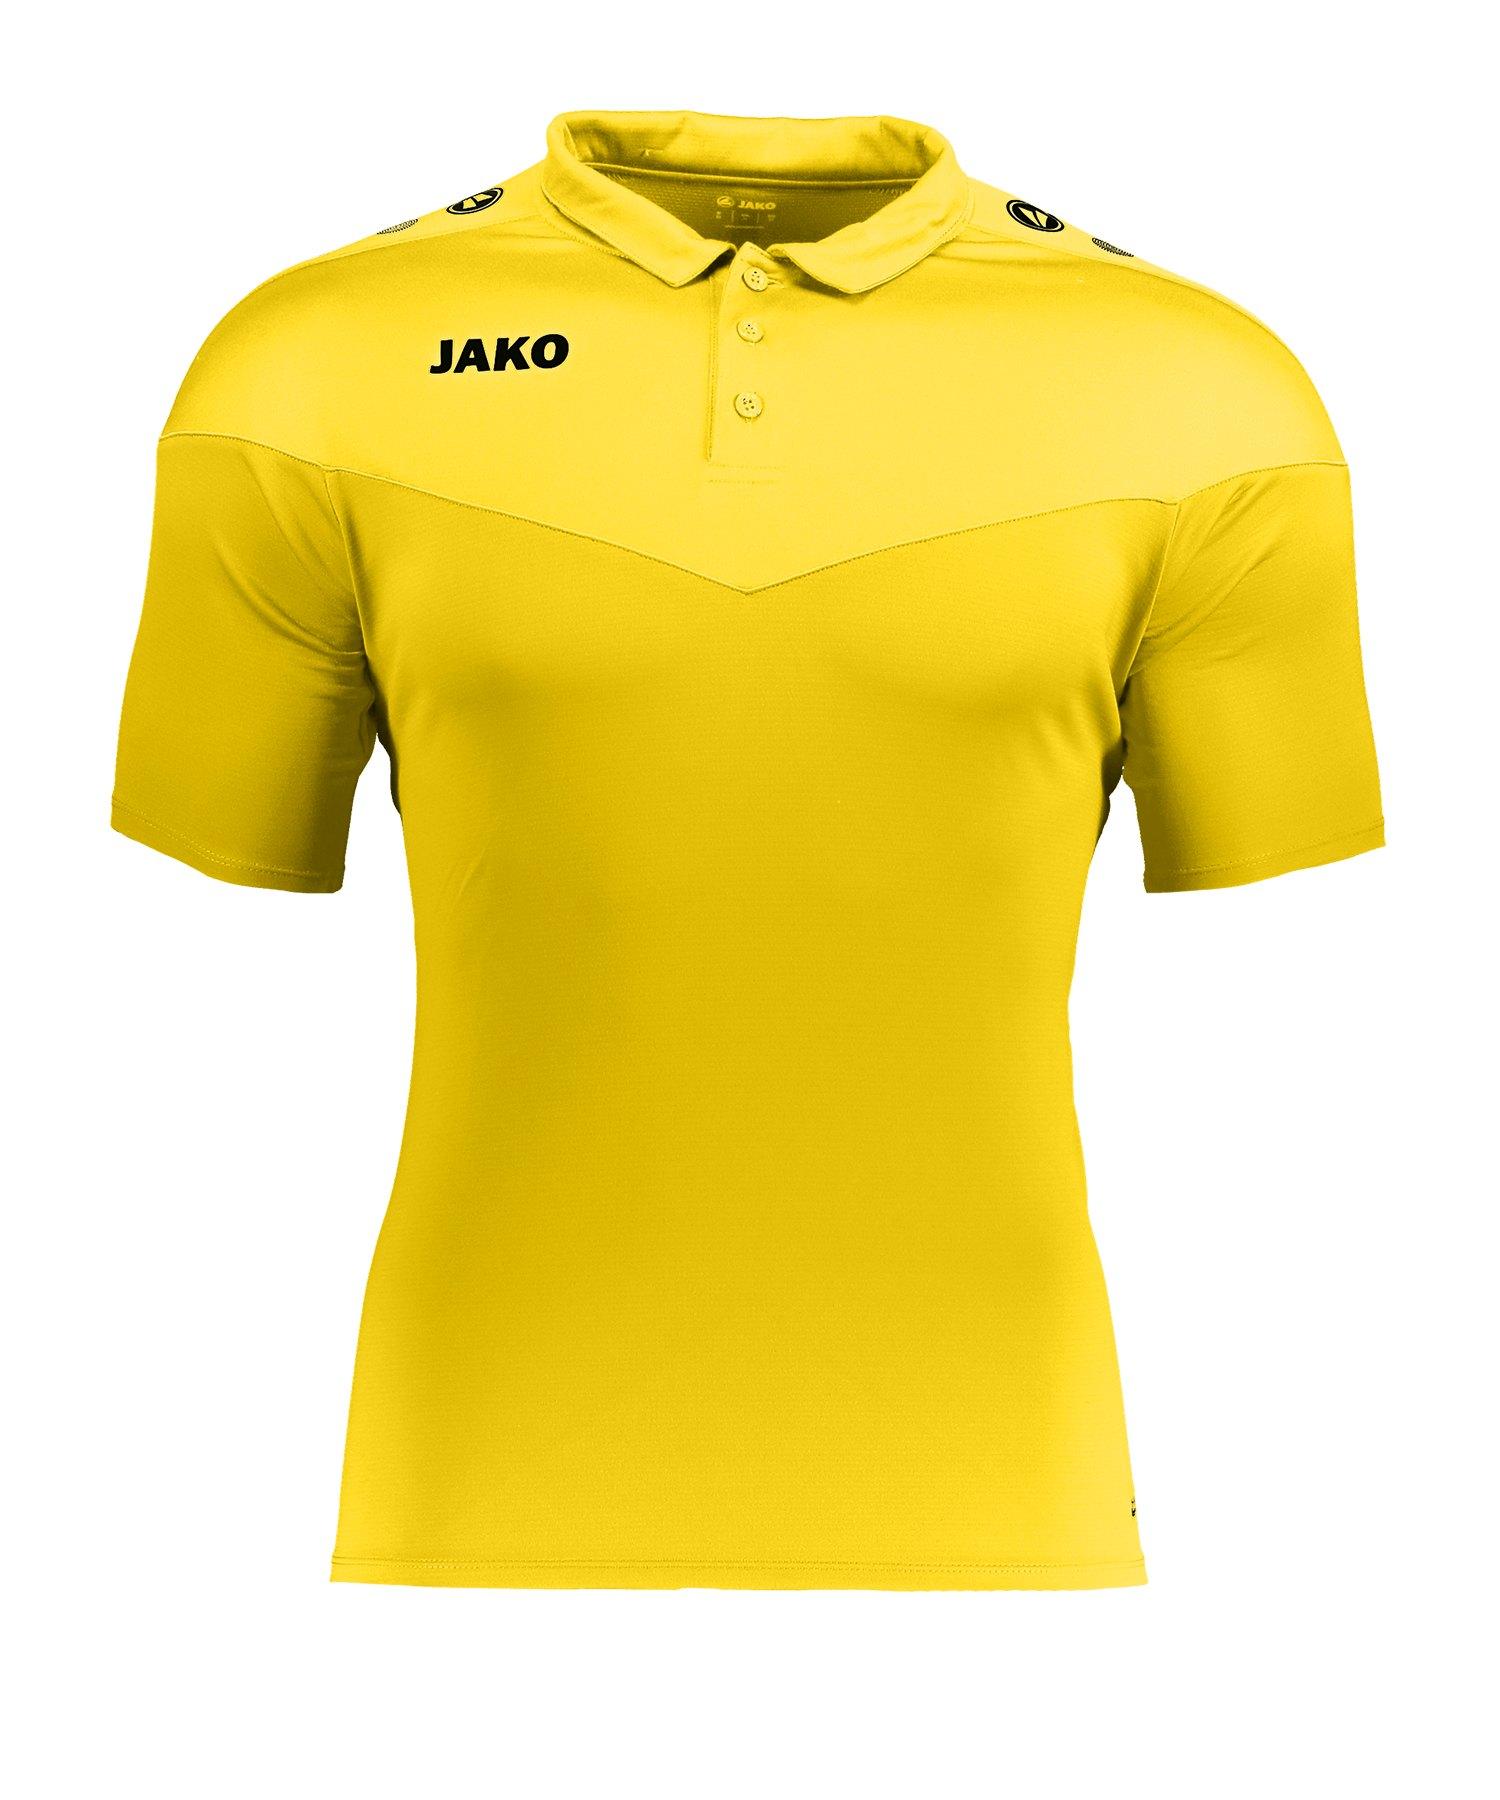 Jako Champ 2.0 Poloshirt Kids Gelb F03 - gelb